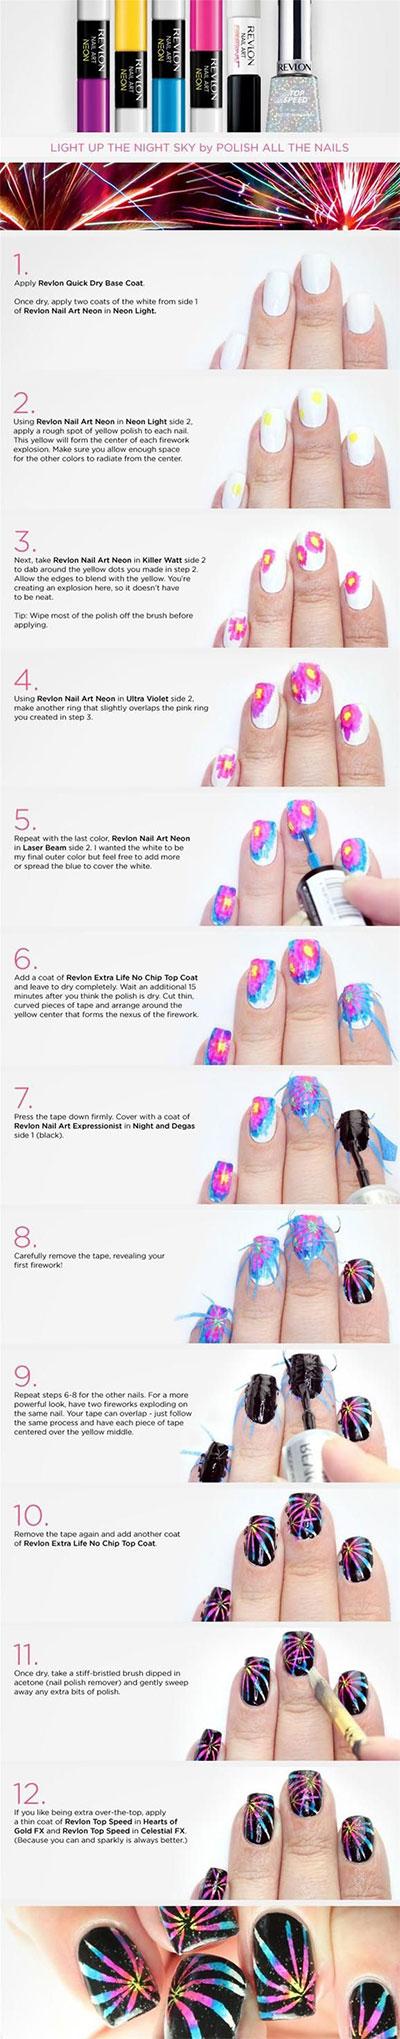 15-Pretty-Nail-Art-Tutorials-For-Beginners-Learners-2014-13